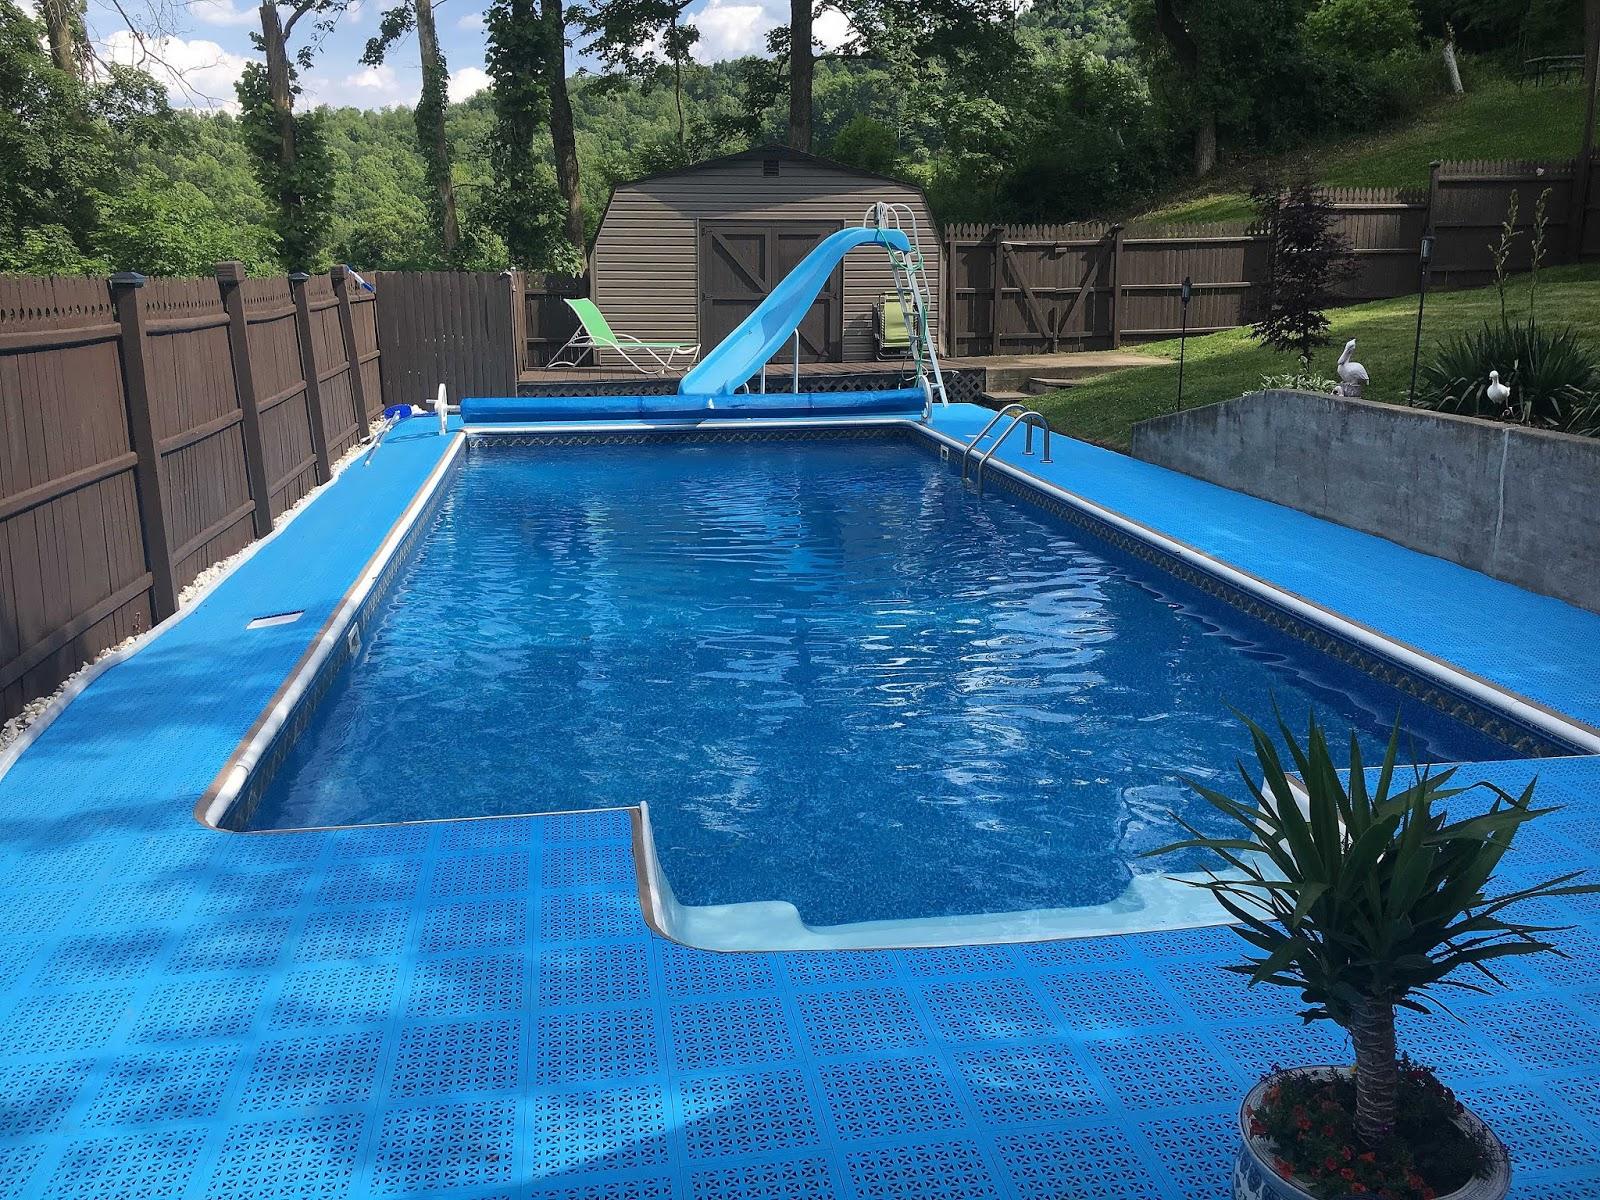 rectangle rhino floor pool itm padding liner for guard swimming pools protector shield intex